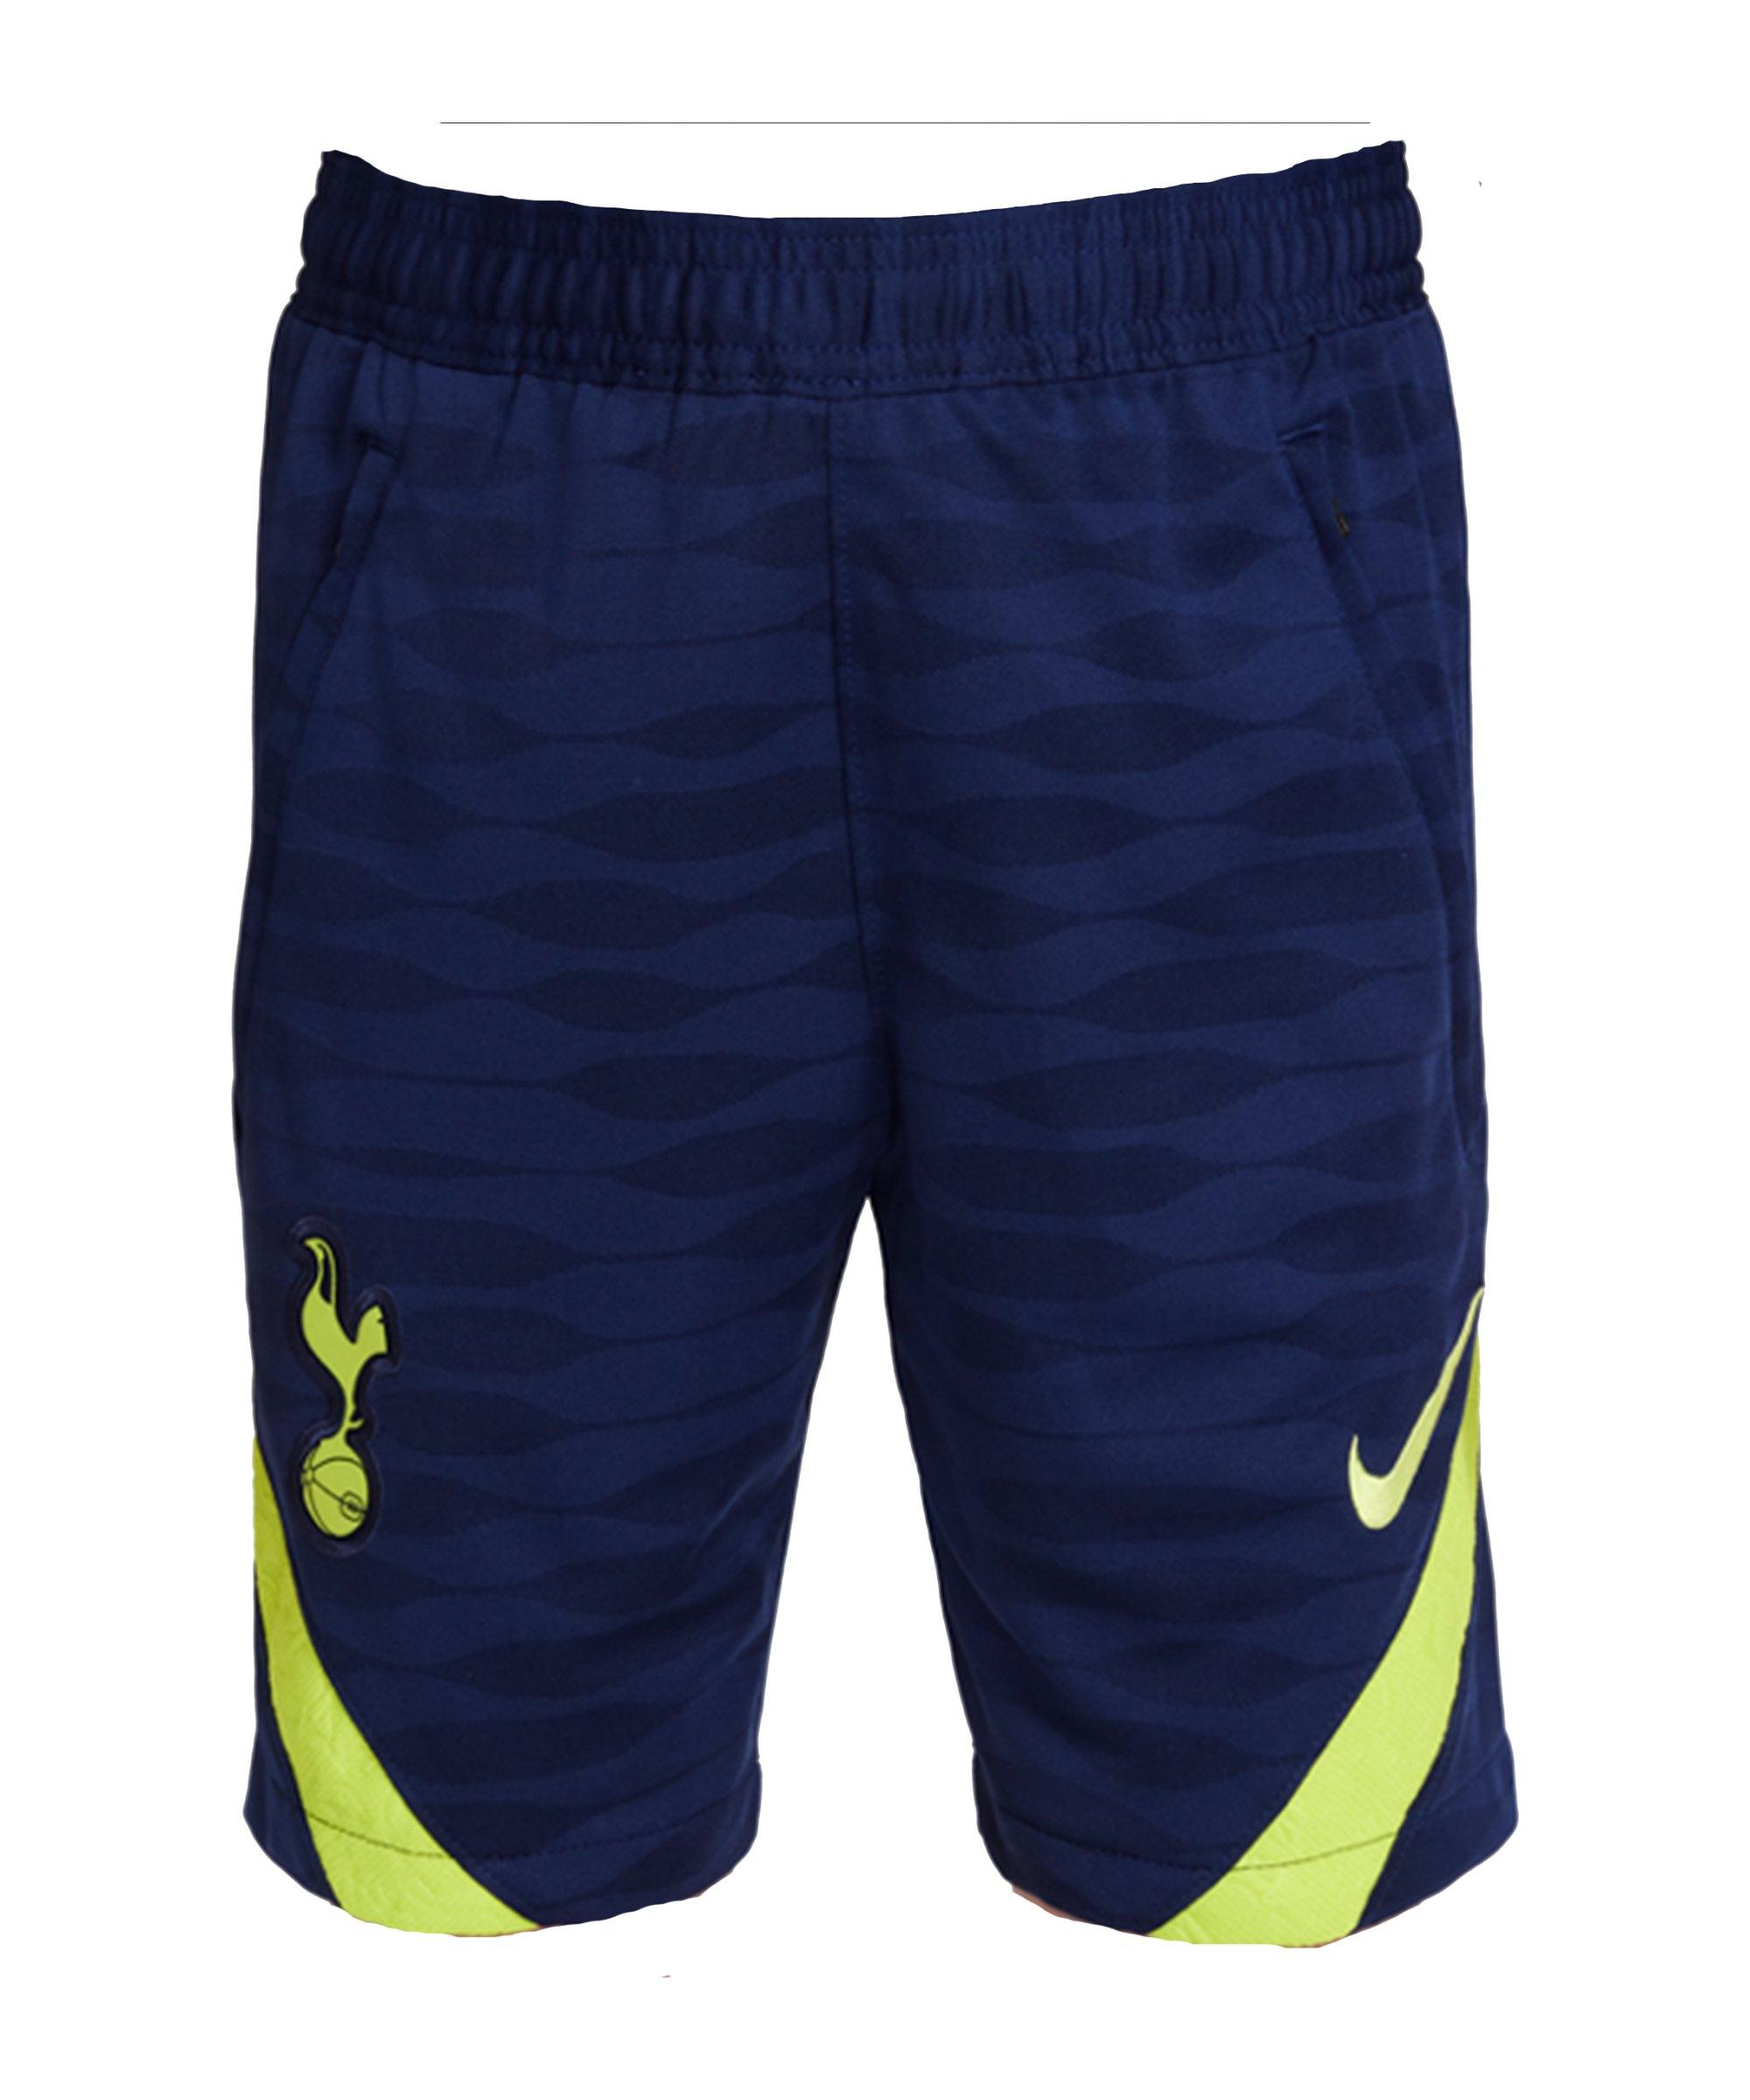 Nike Tottenham Hotspur Short Kids Blau F429 - blau